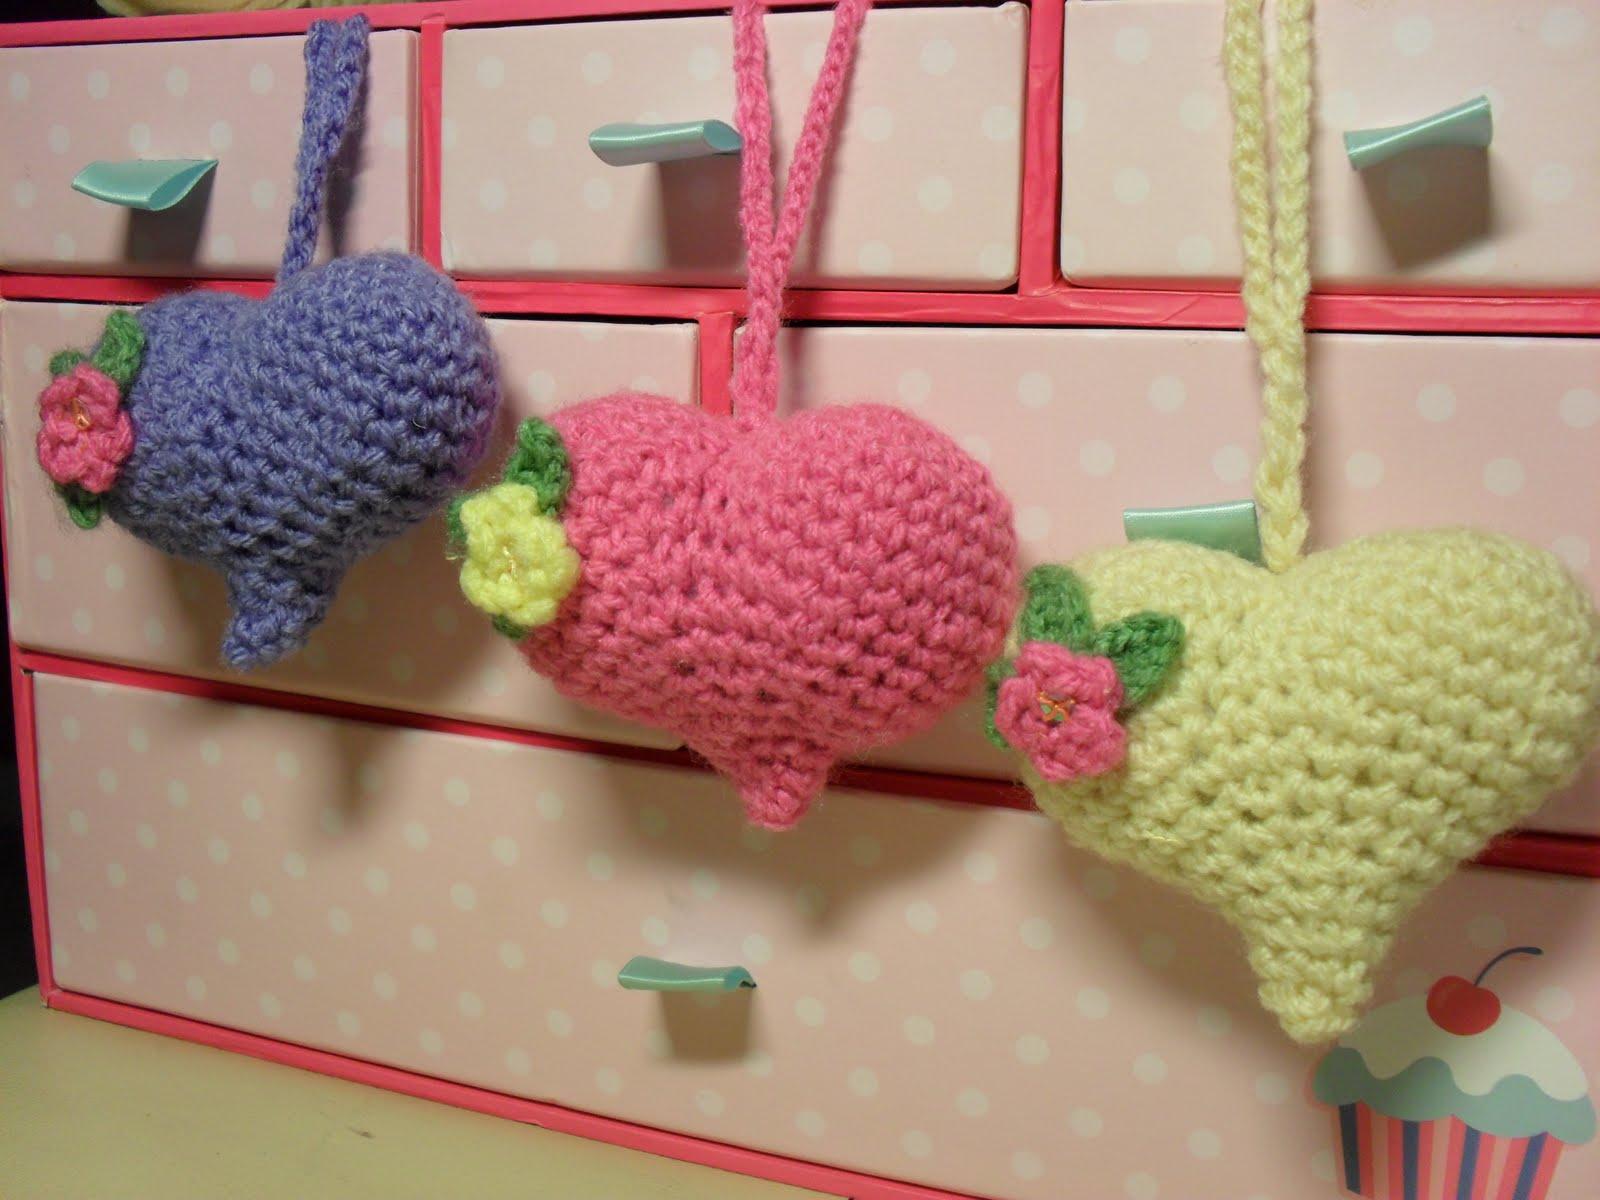 Amigurumi Keychain Pattern Free : Amigurumi Barmy: Heart pattern